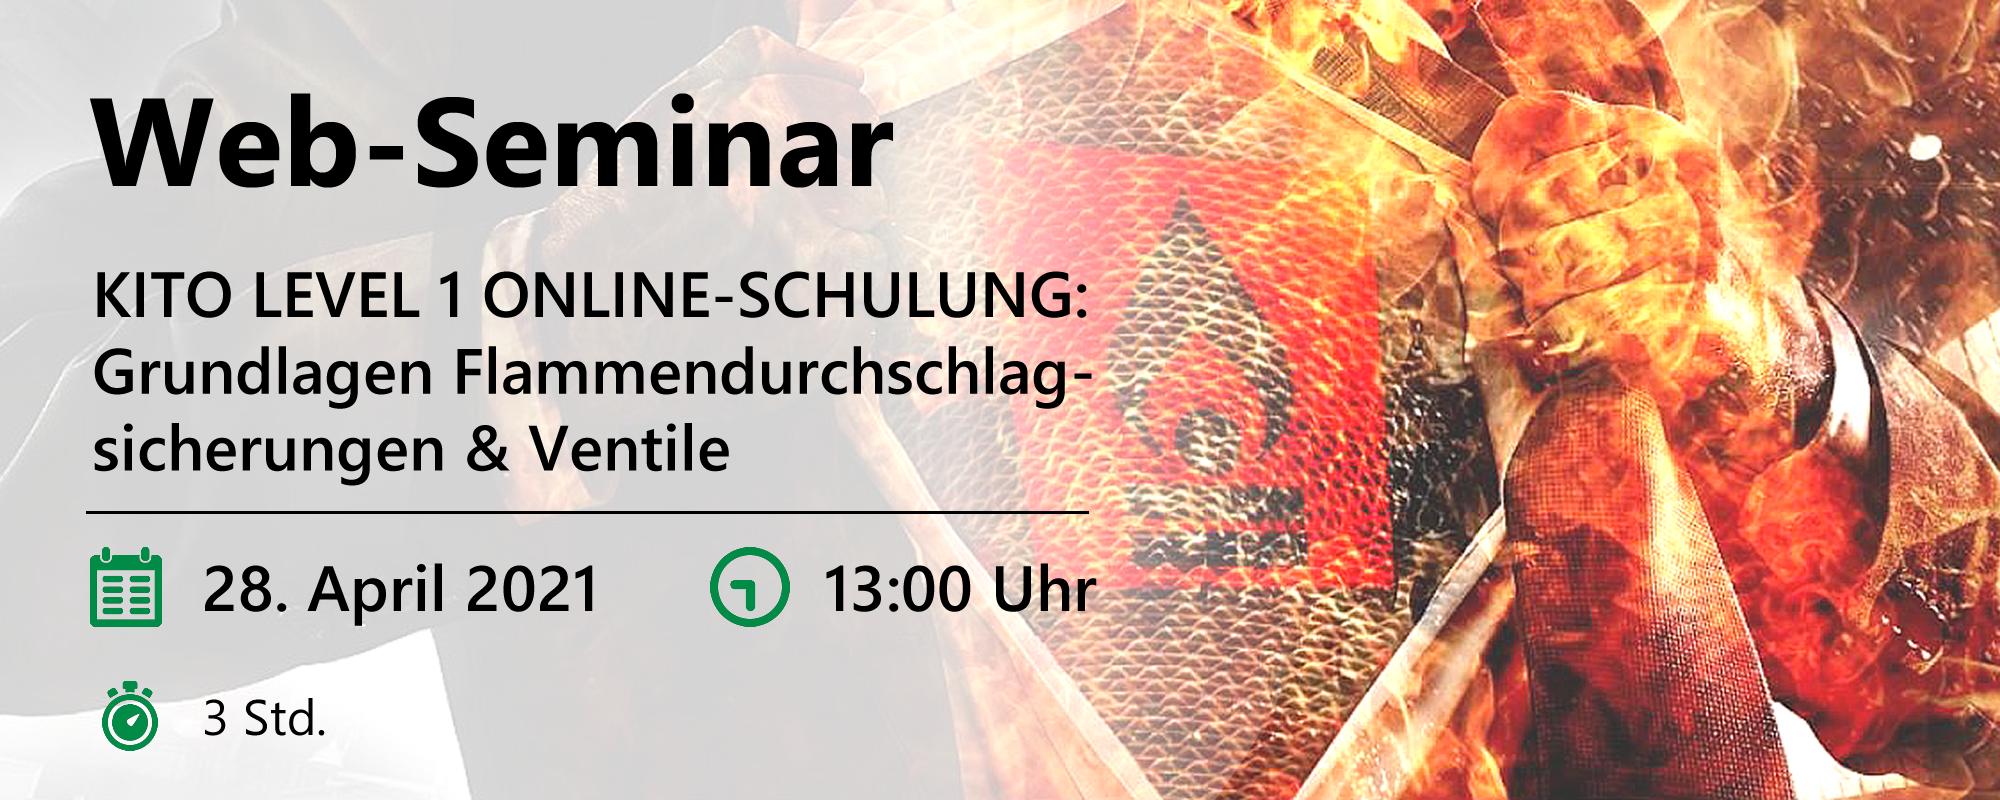 Web-Seminar am 28.04.2021